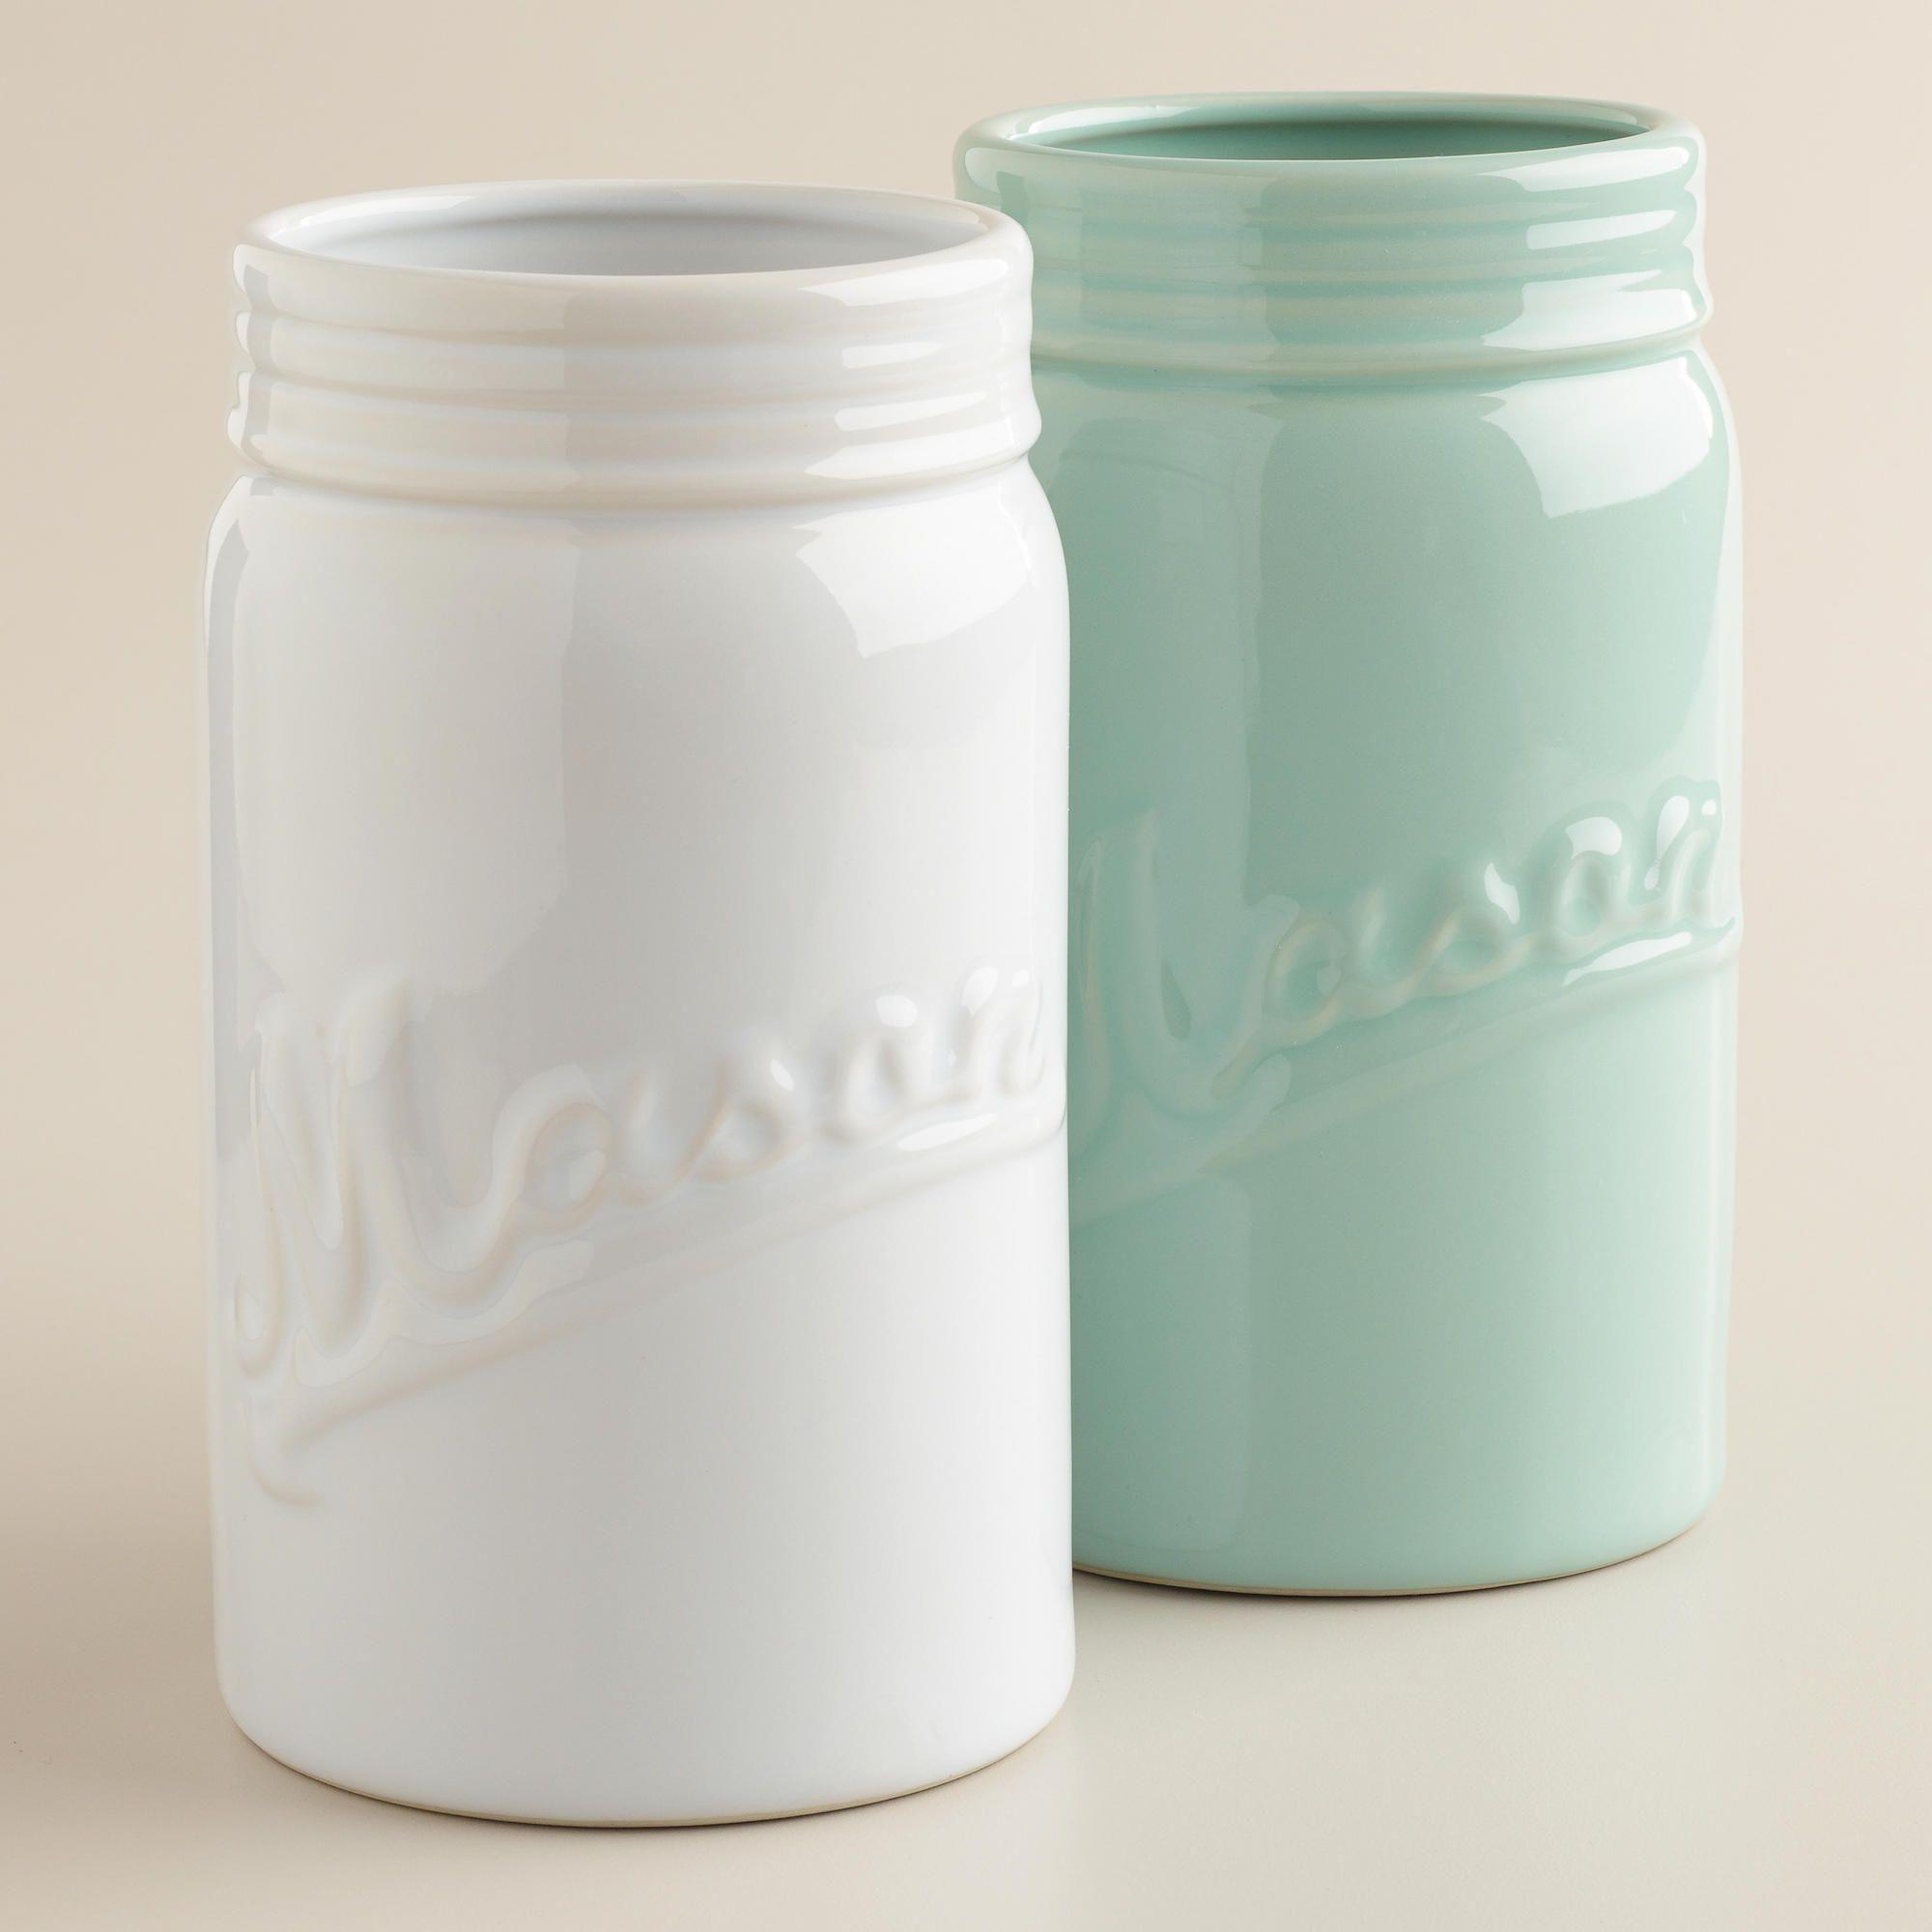 mason jar vase ideas of 18 elegant mason jar hanging wall vase bogekompresorturkiye com for mason jar vases 56a490d23df78cf c